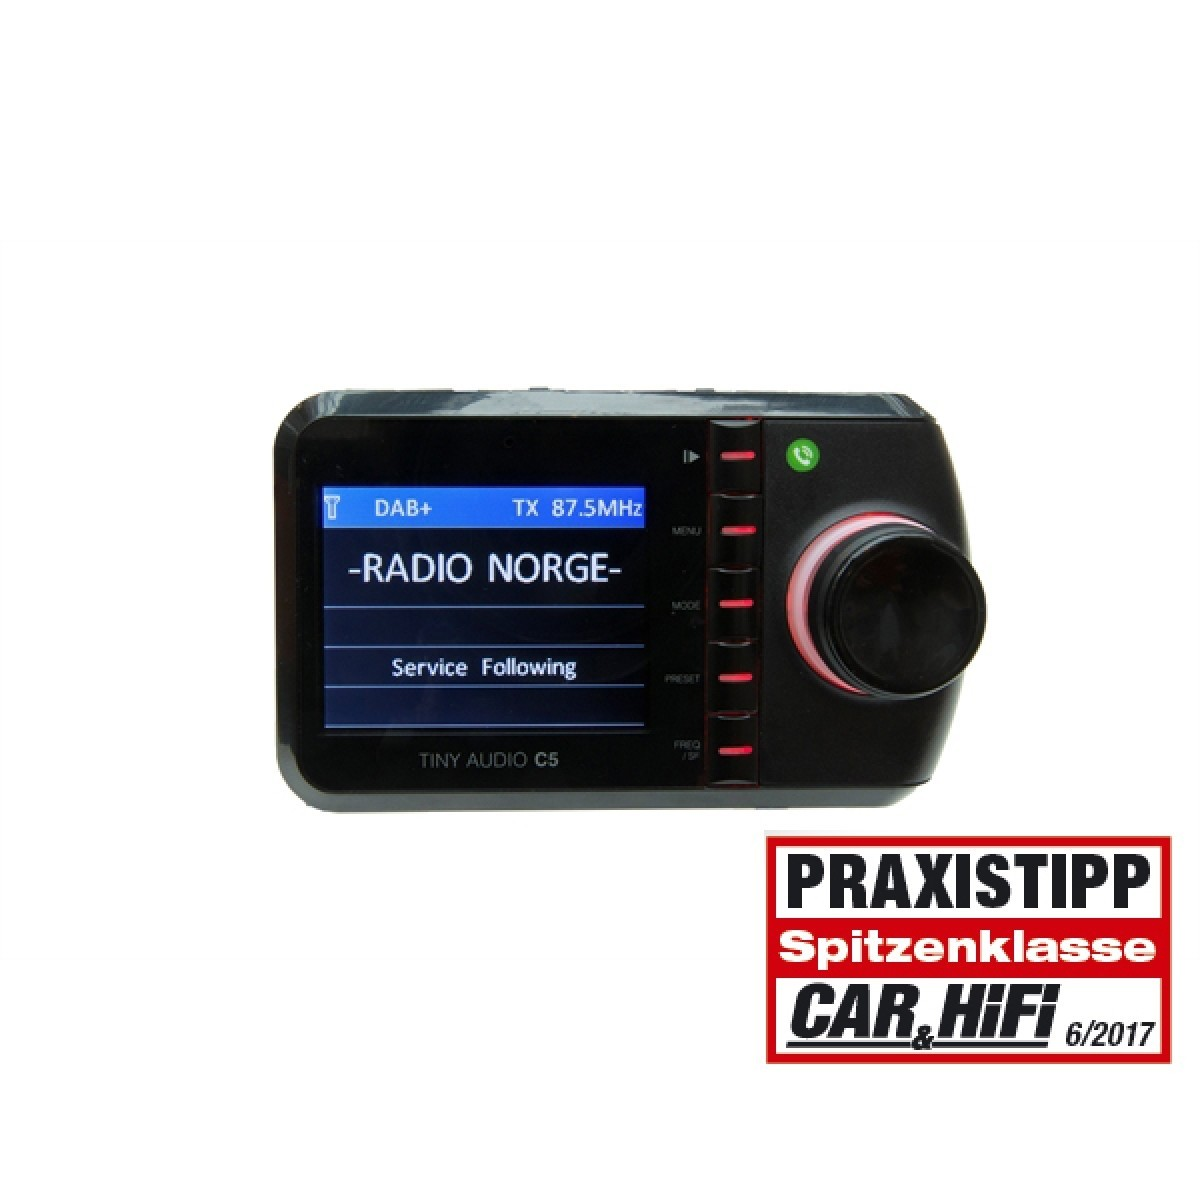 TINY Audio C5 Autoradio DAB+ Adapter mit Bluetooth Streaming